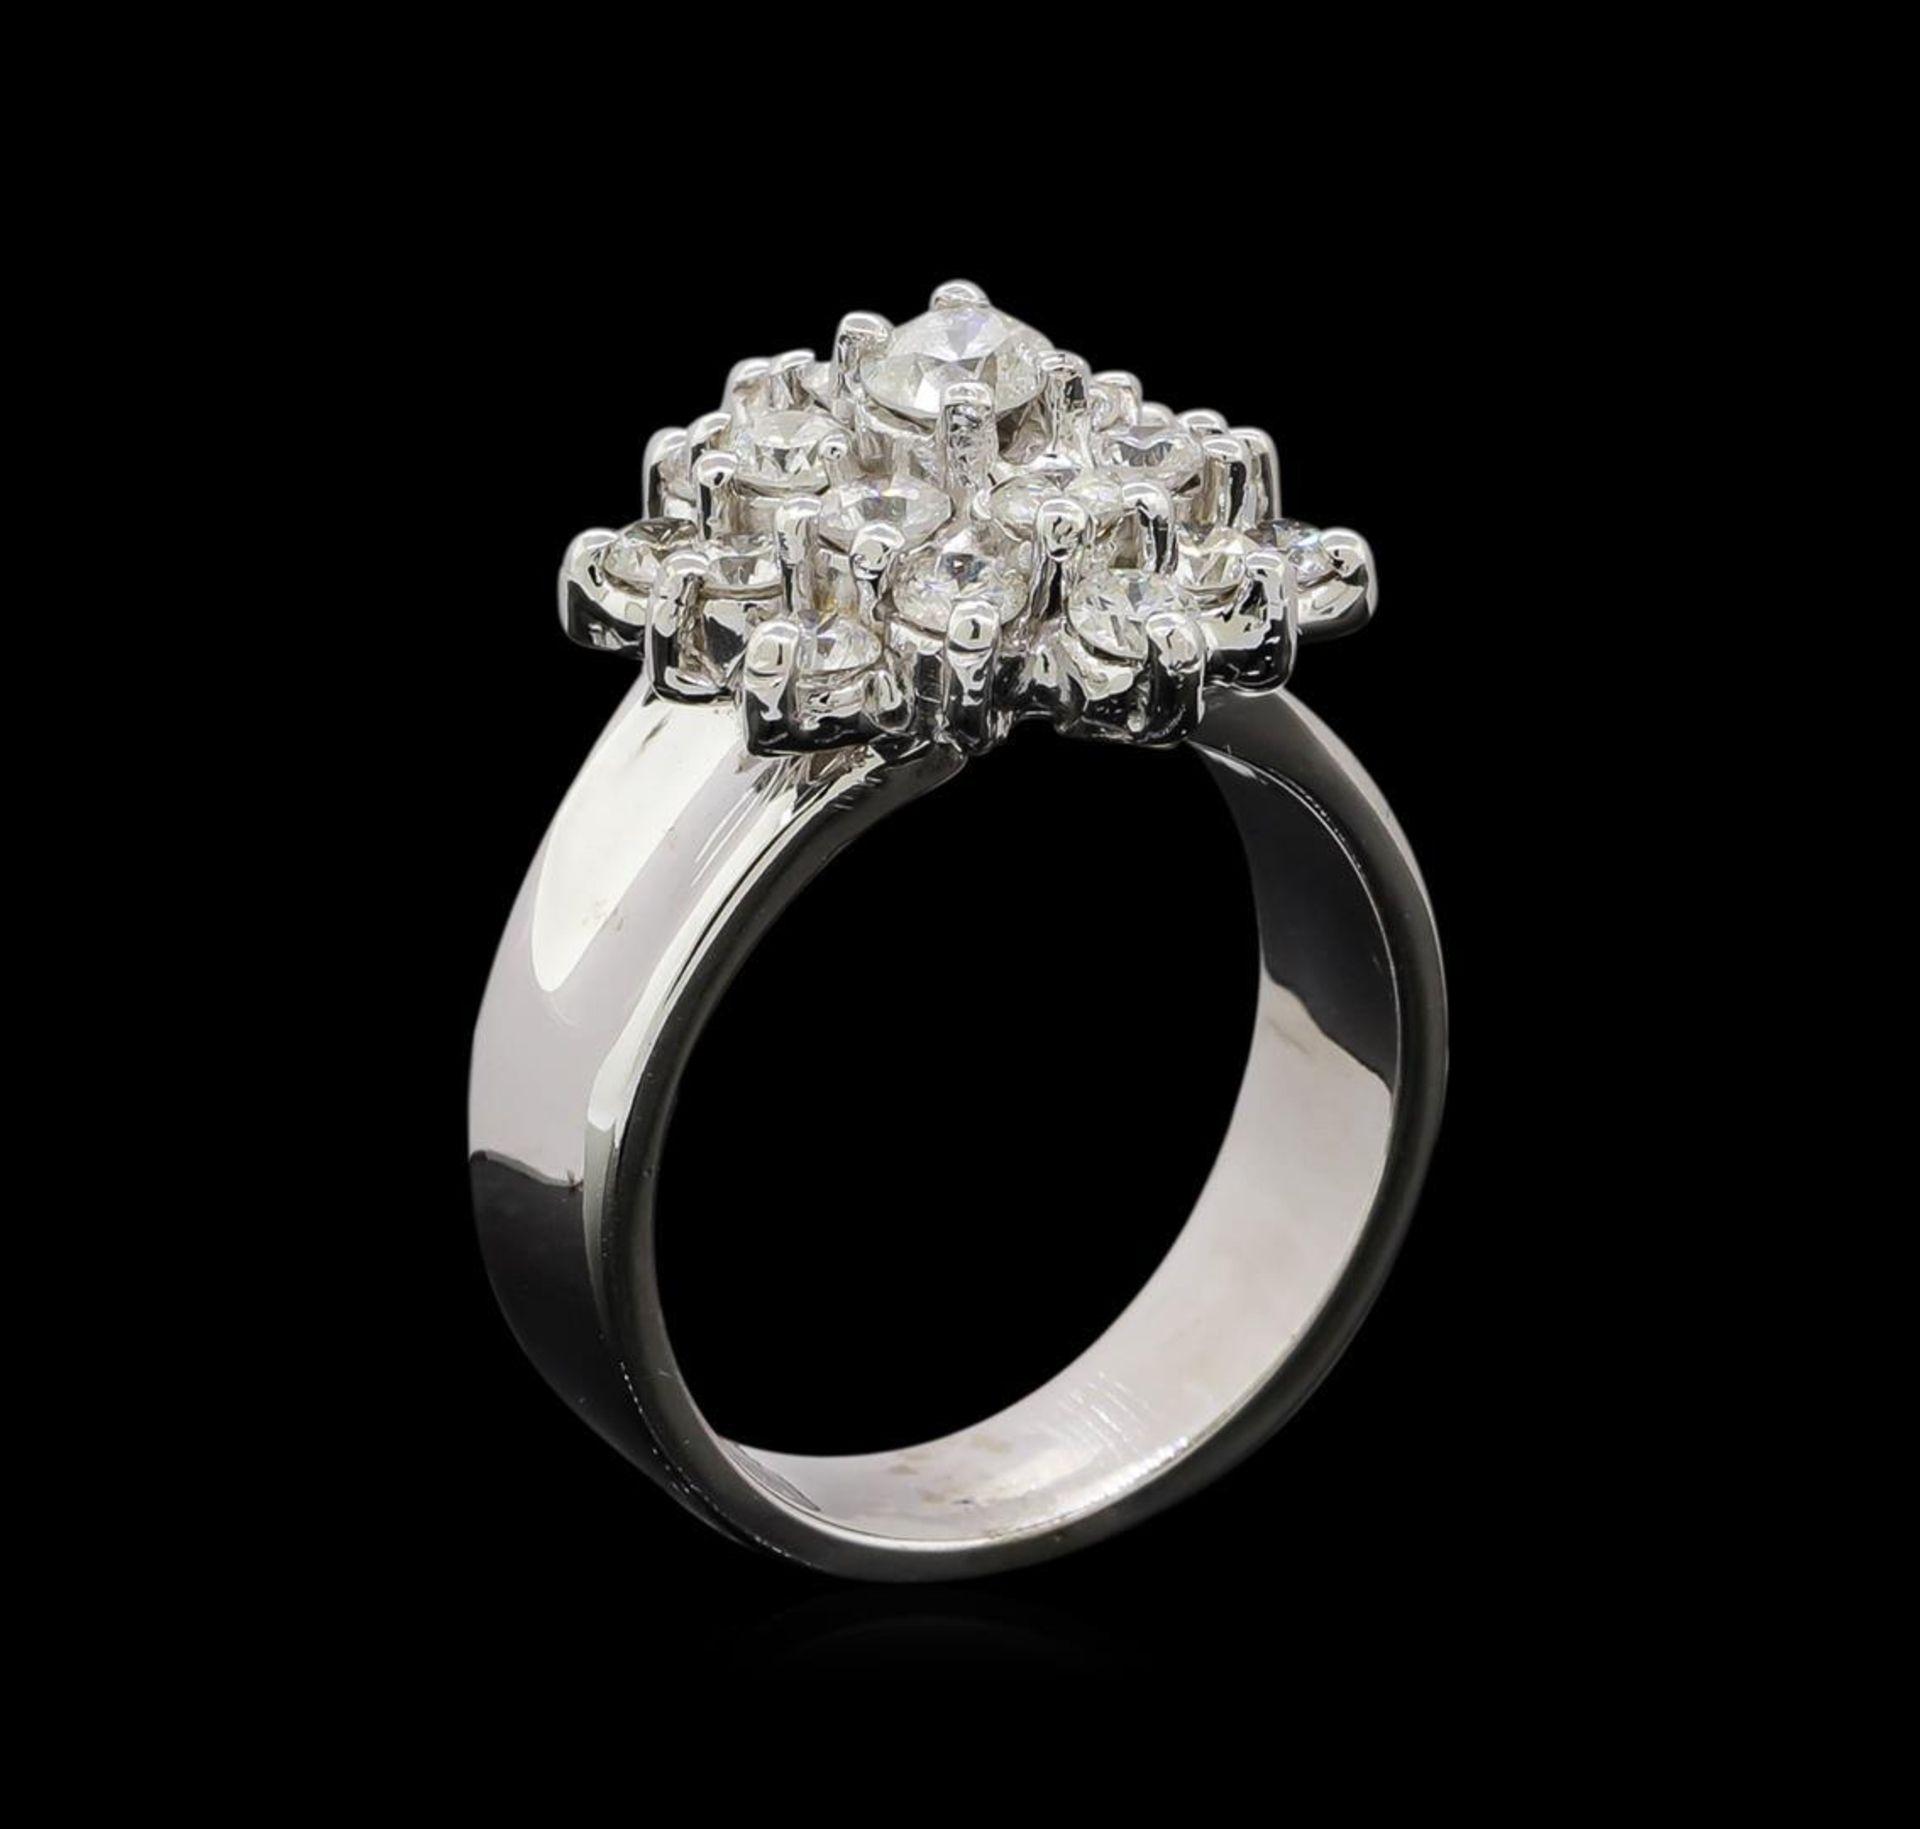 14KT White Gold 1.55 ctw Diamond Ring - Image 4 of 5